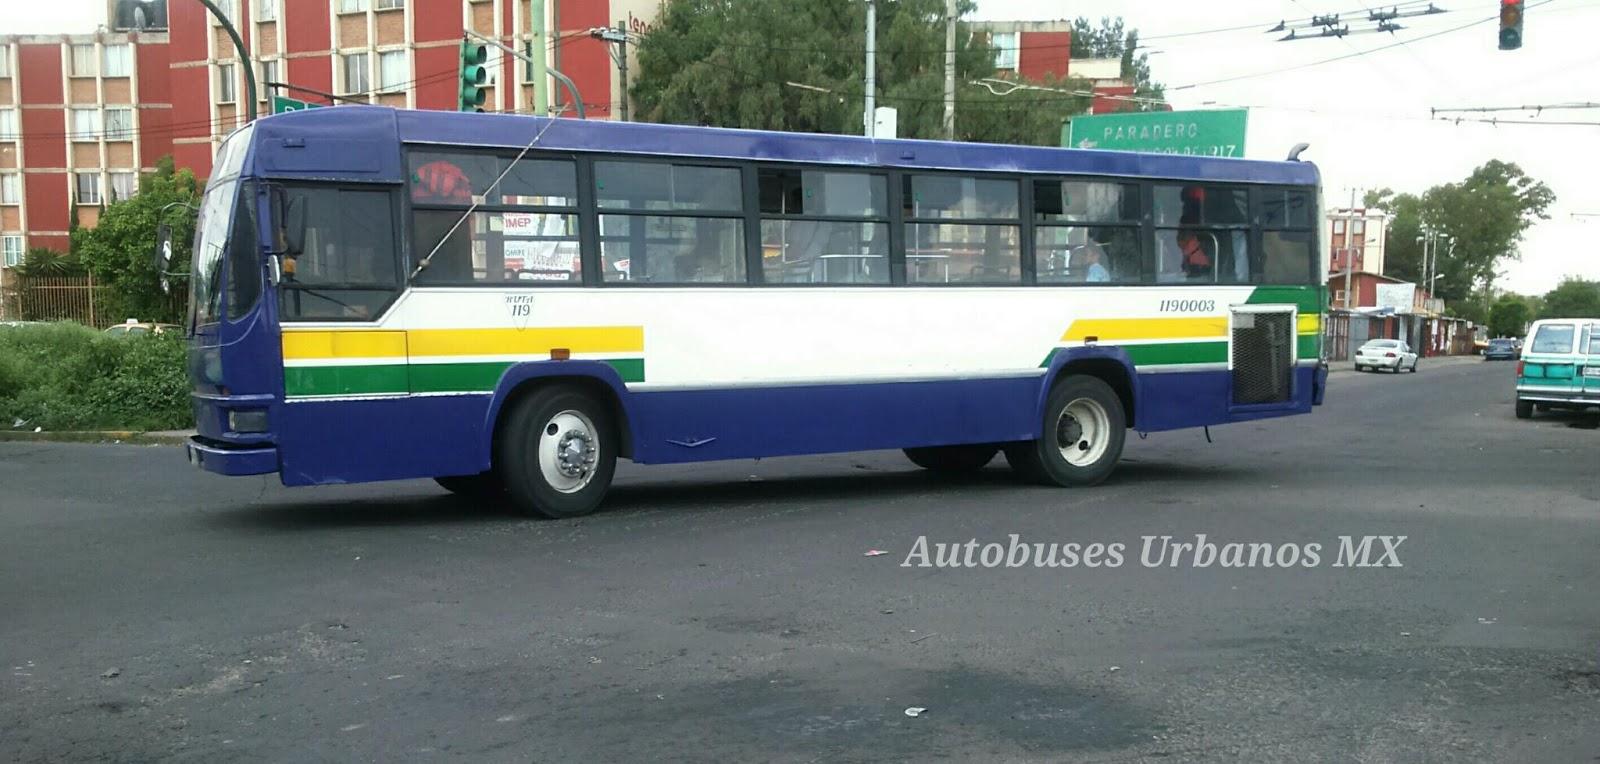 Autobuses urbanos ciudad de m xico mercedes benz eurocar for Mercedes benz com mx mexico